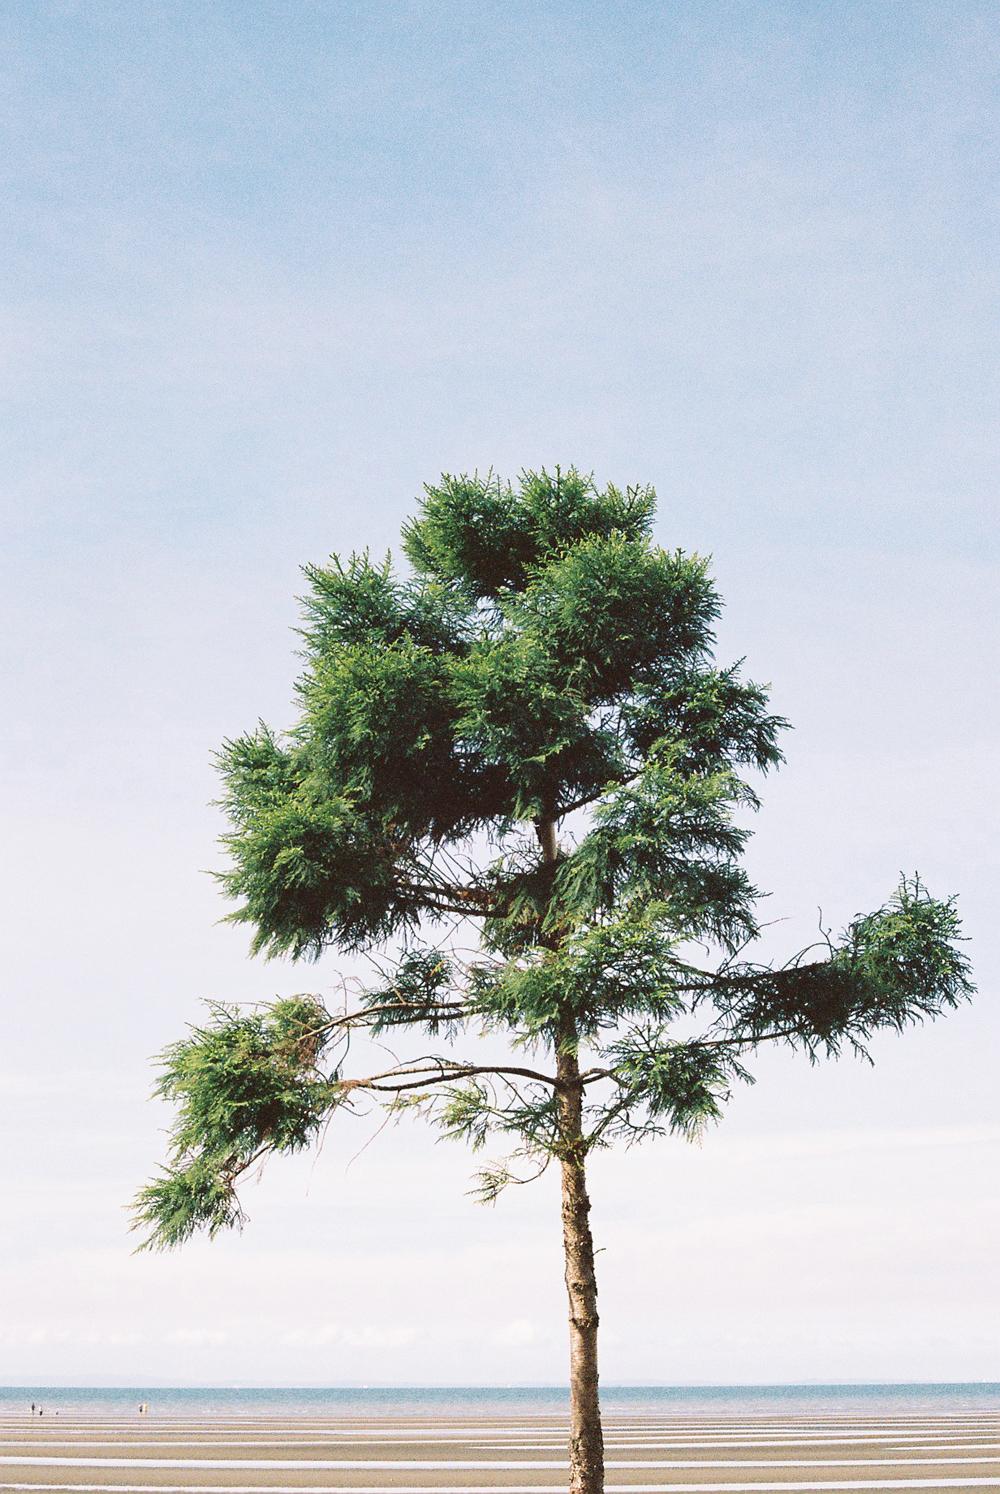 sandgate+brisbane+tree+35mm+film+fuji+400H+falling+for+florin.jpg